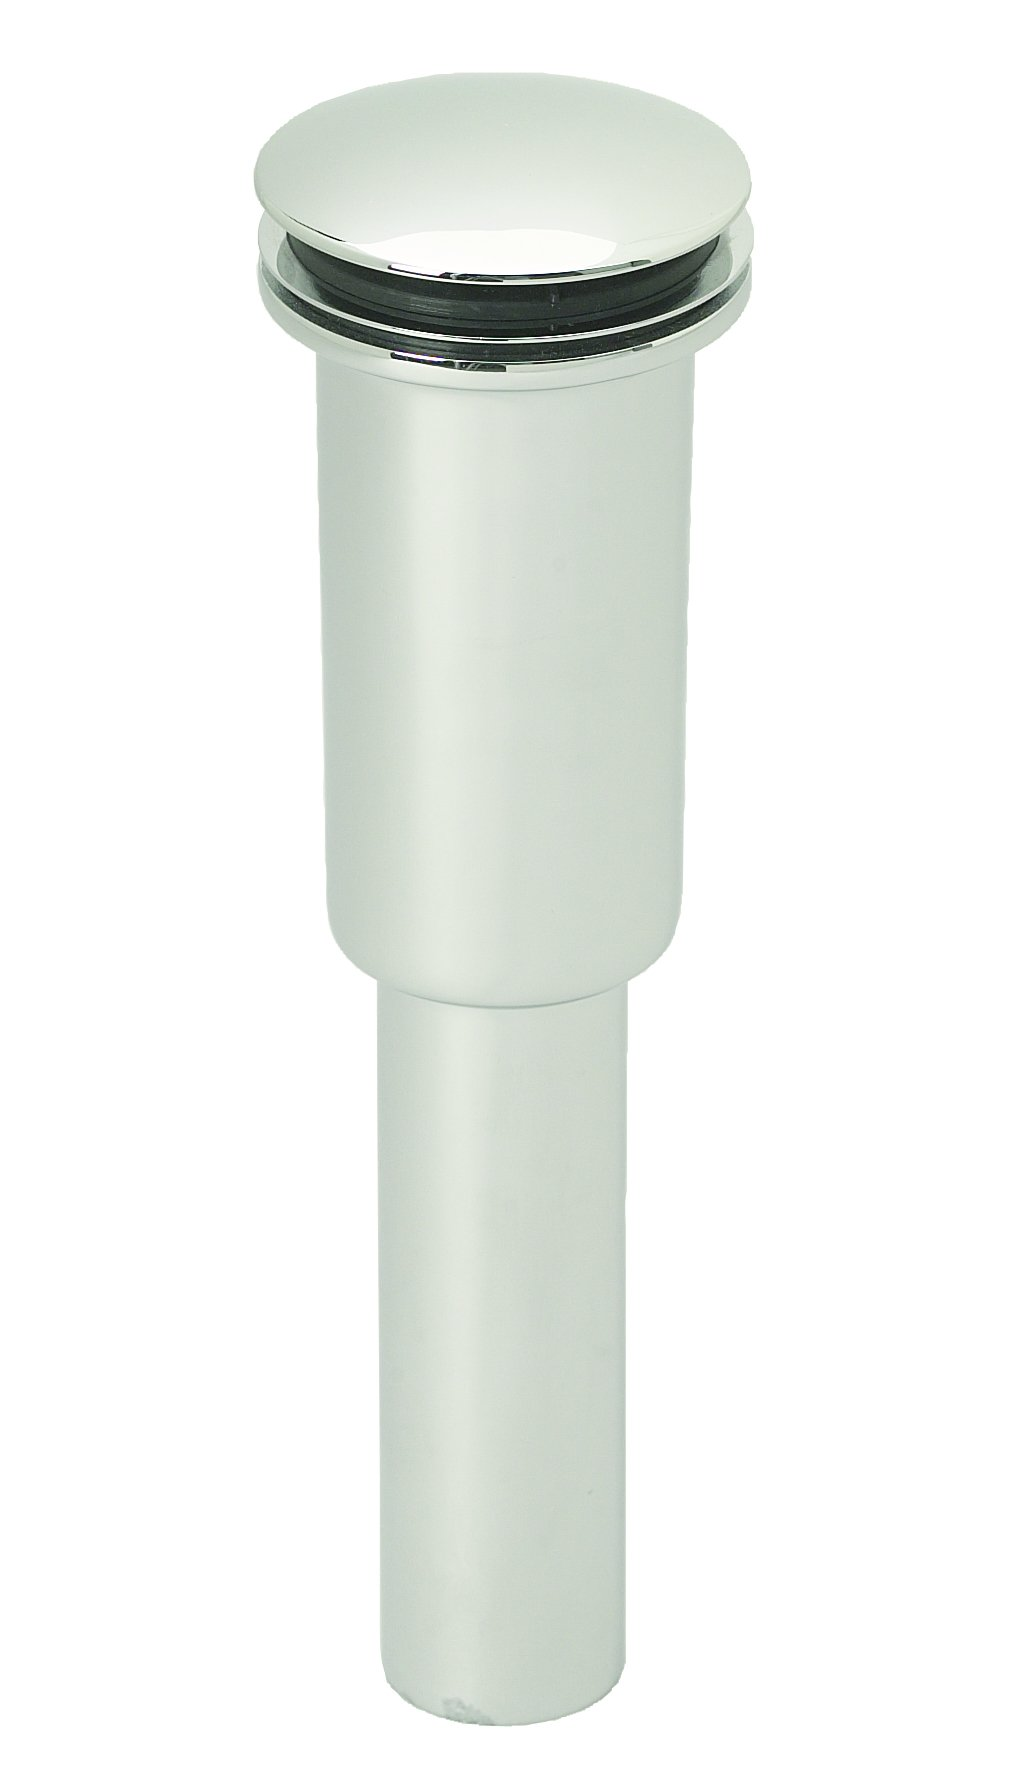 Westbrass R410E-05 Umbrella Universal Lavatory Drain, Polished Nickel